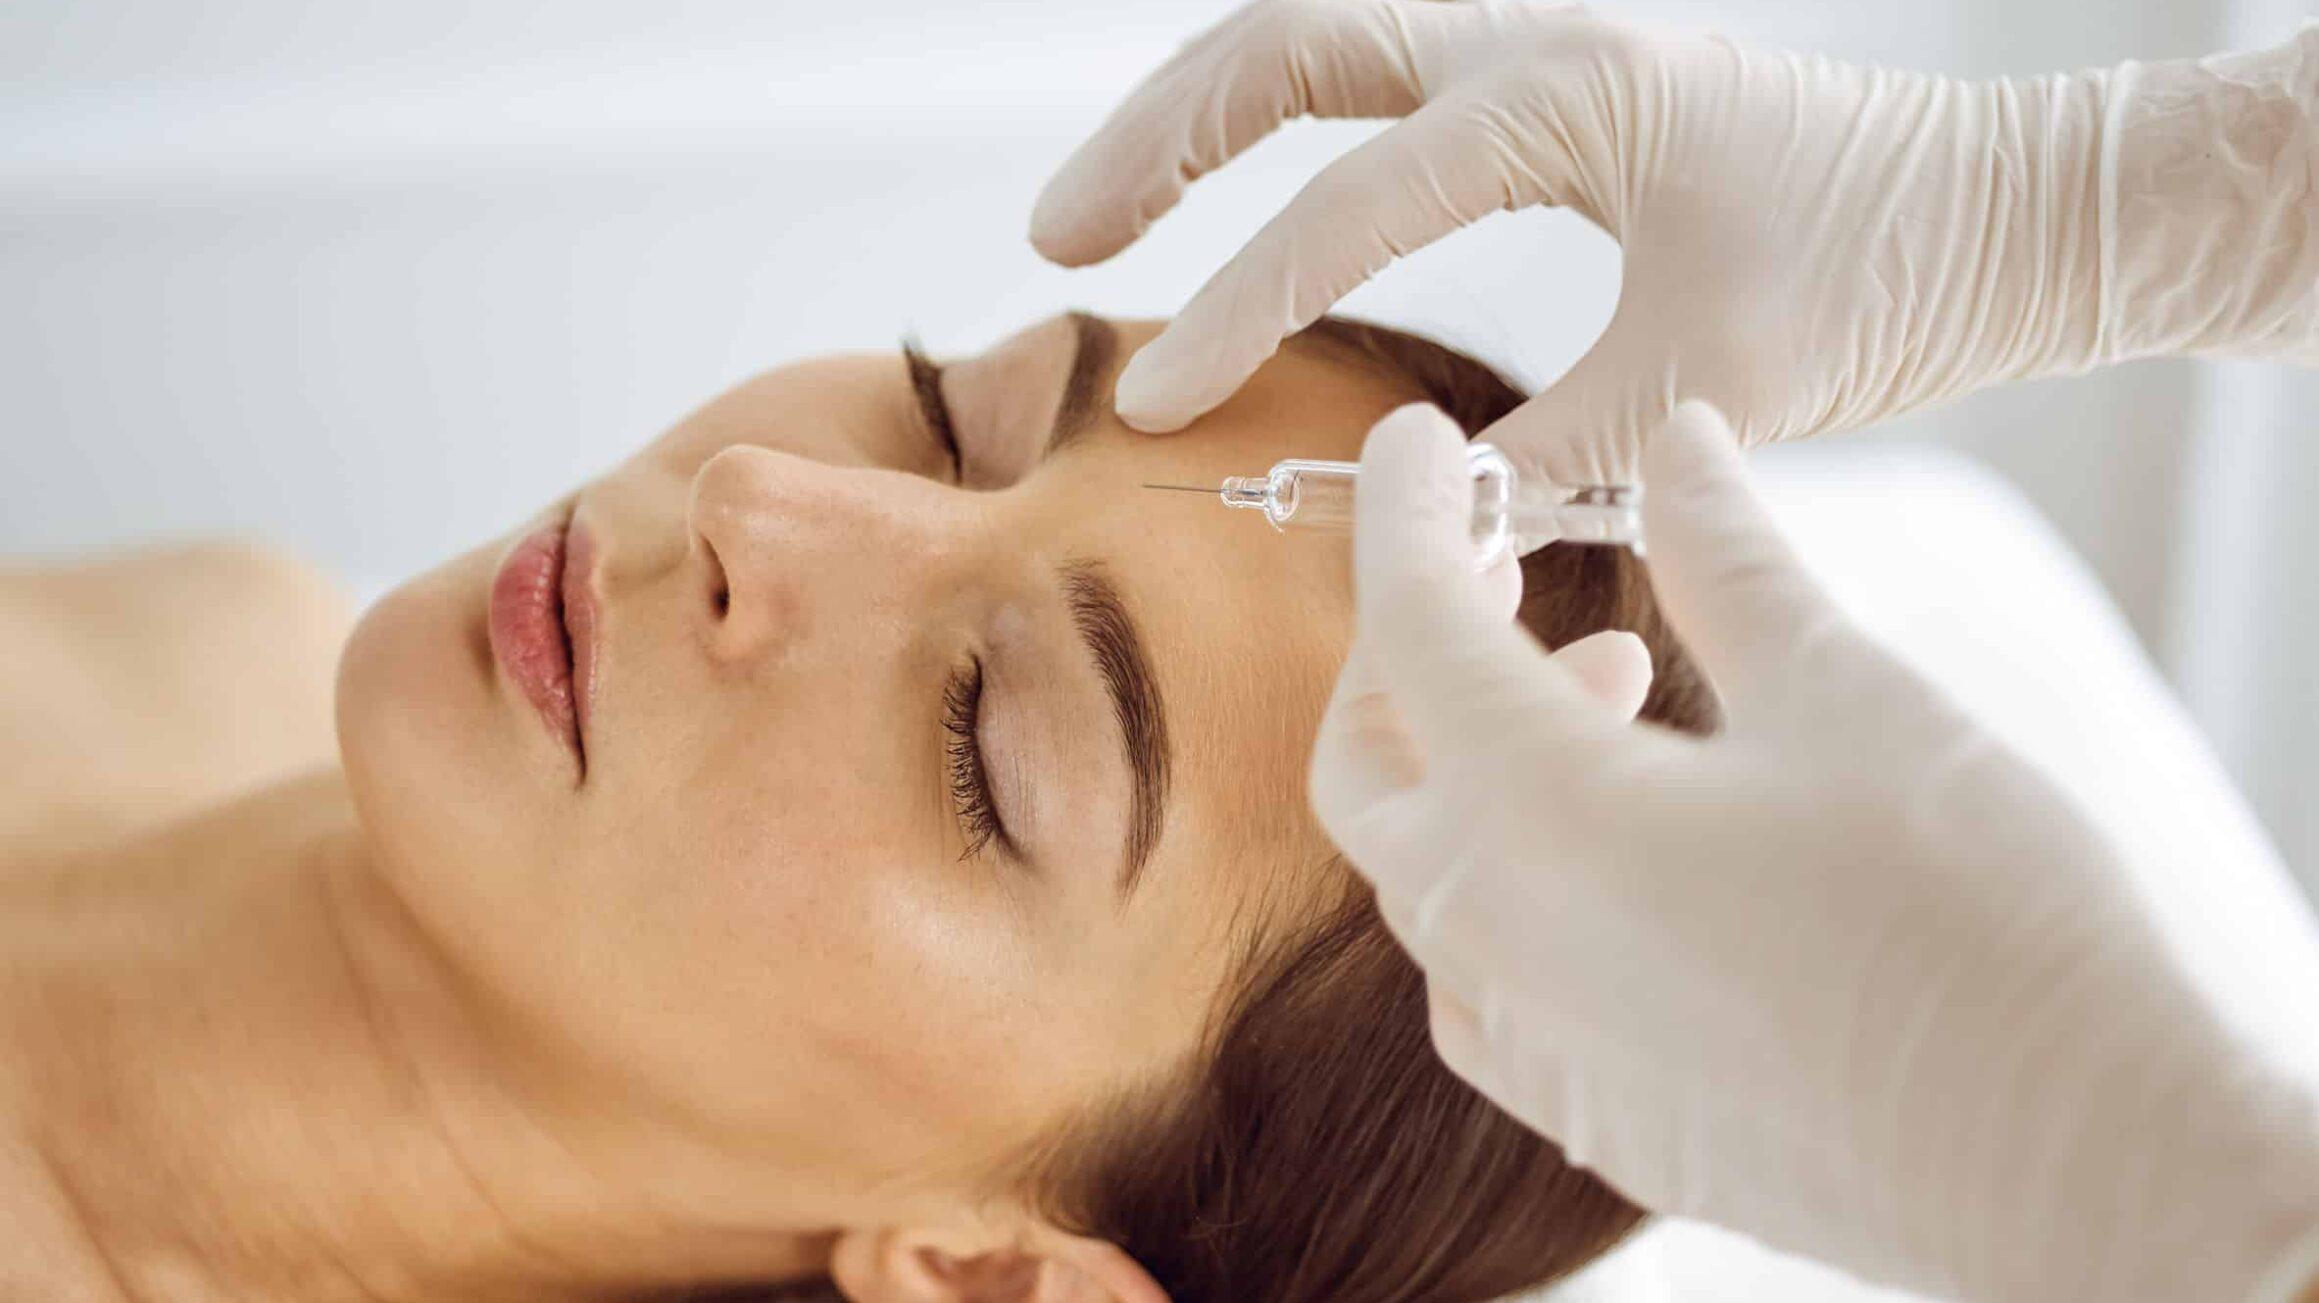 Tulsa plasma therapy injection